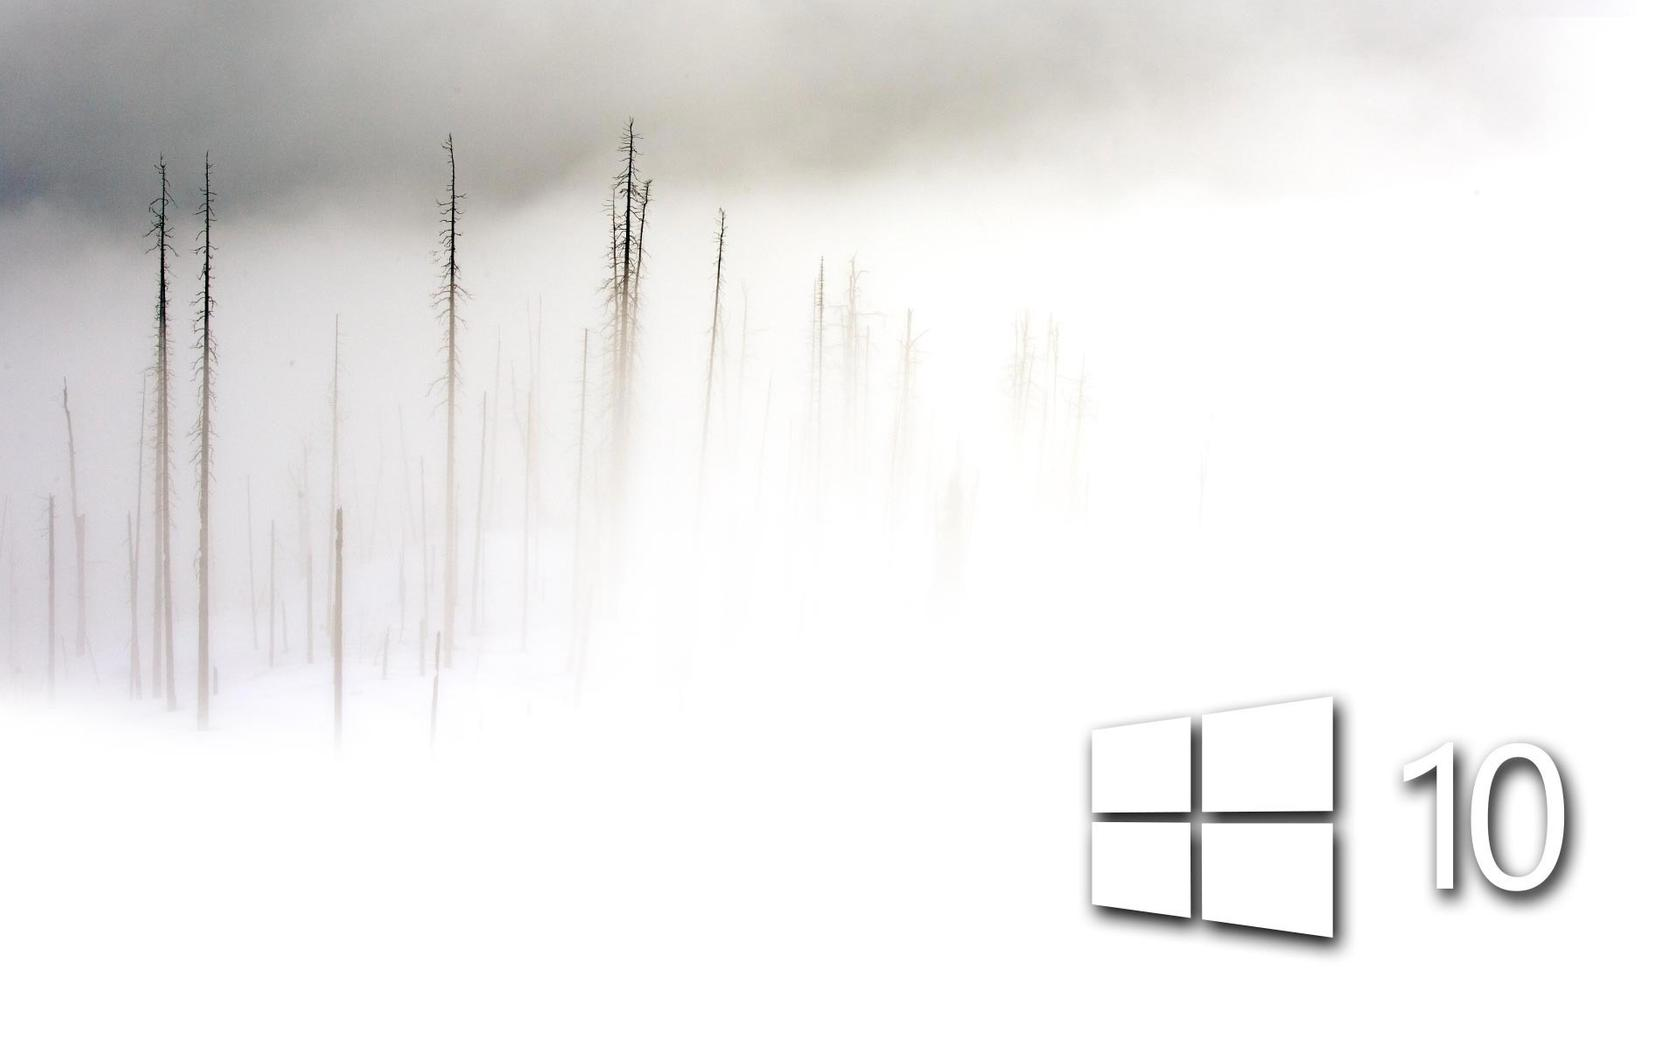 White Windows 10 In The Foam